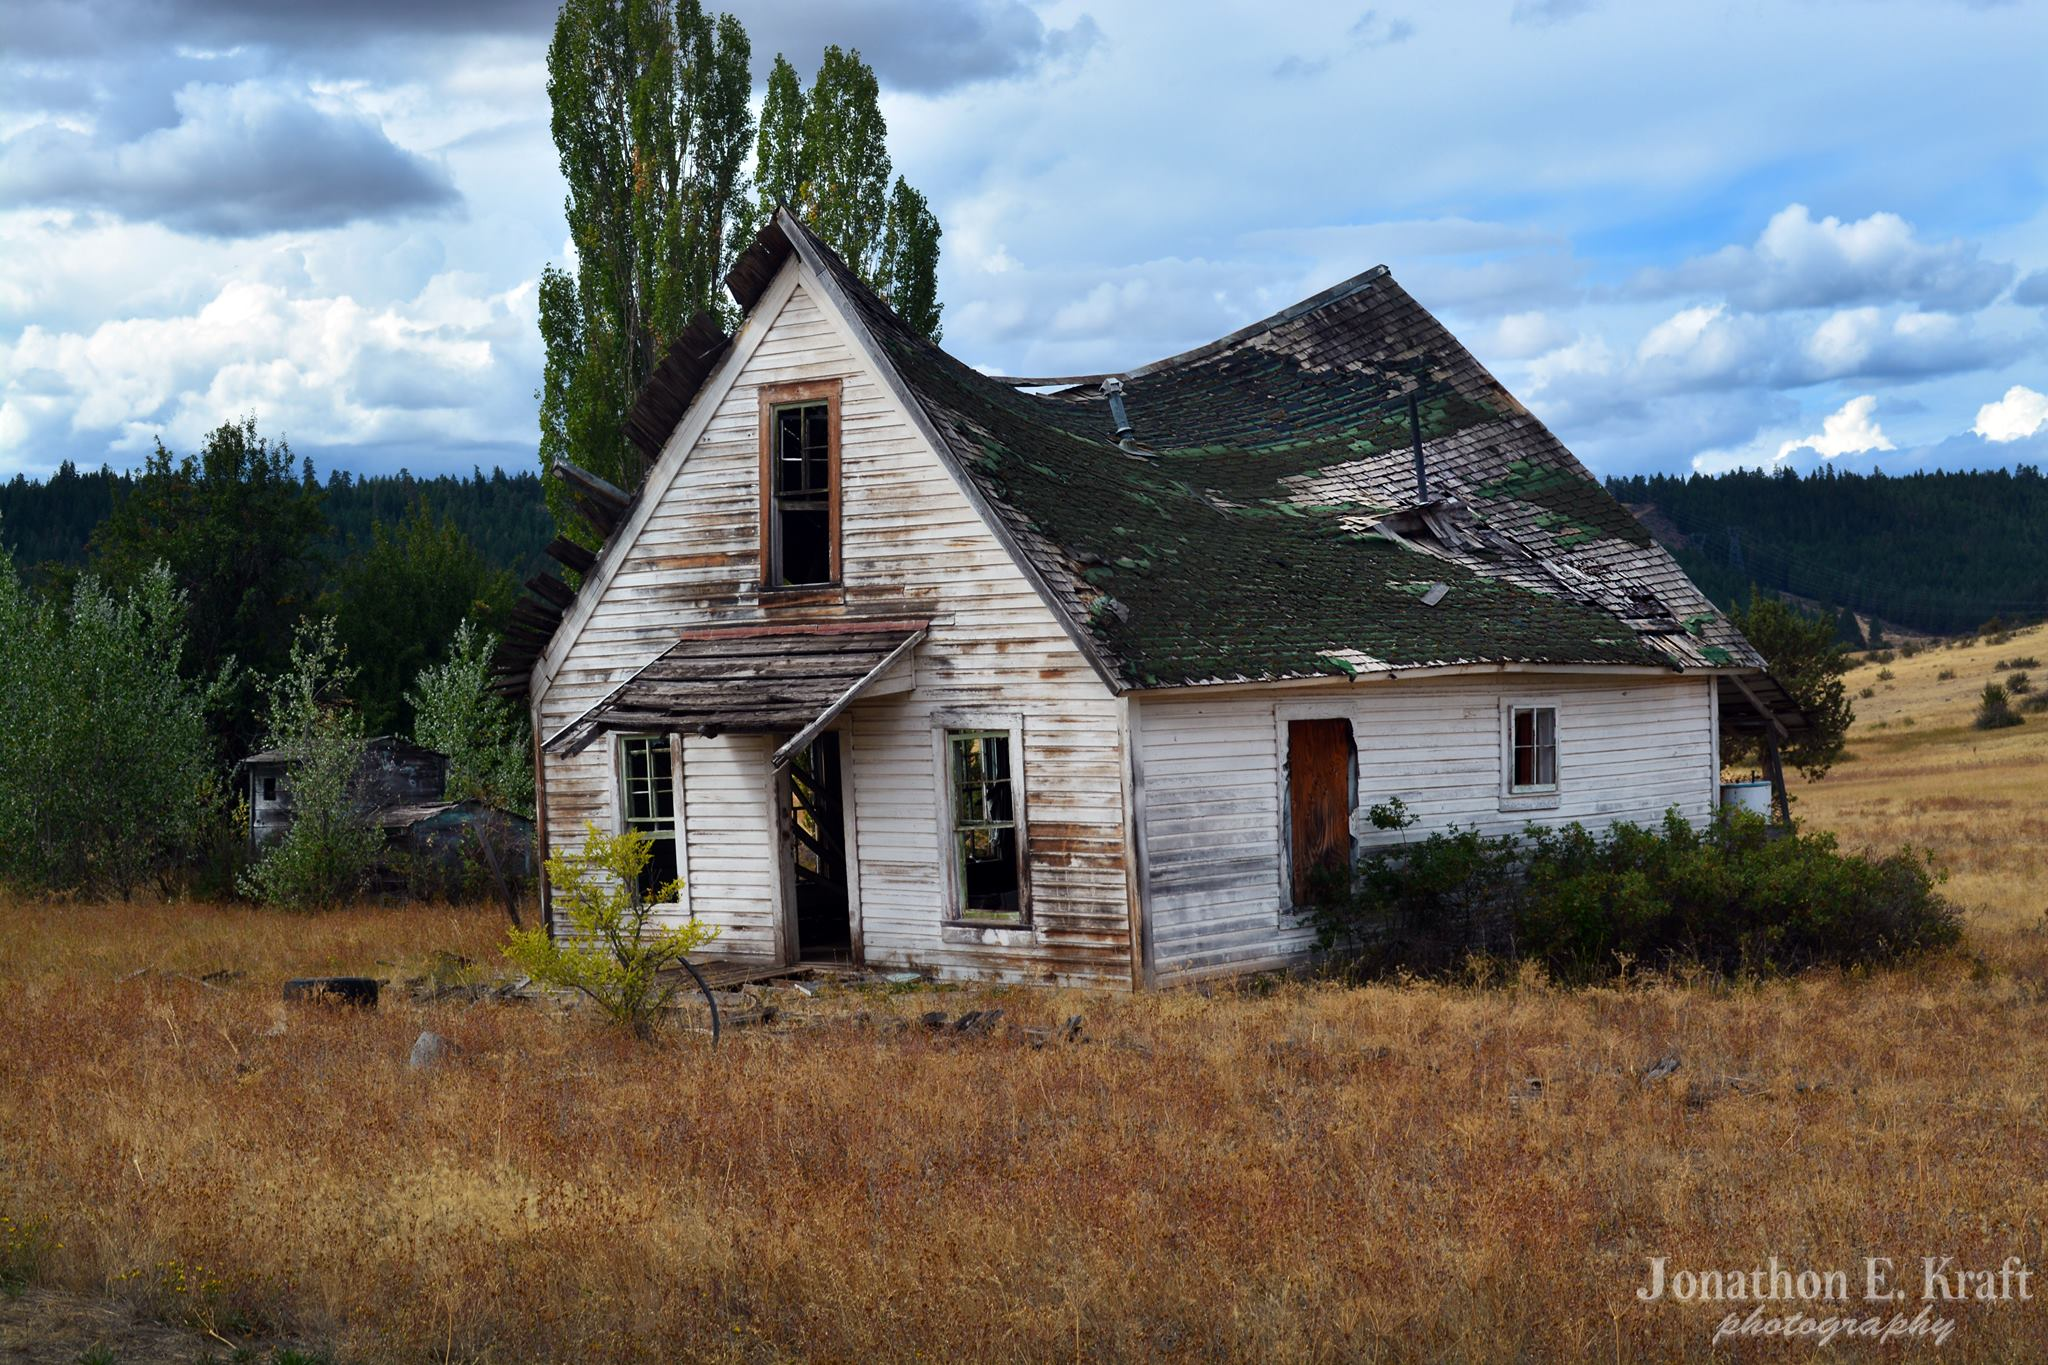 Jon Kraft / Abandoned Oregon